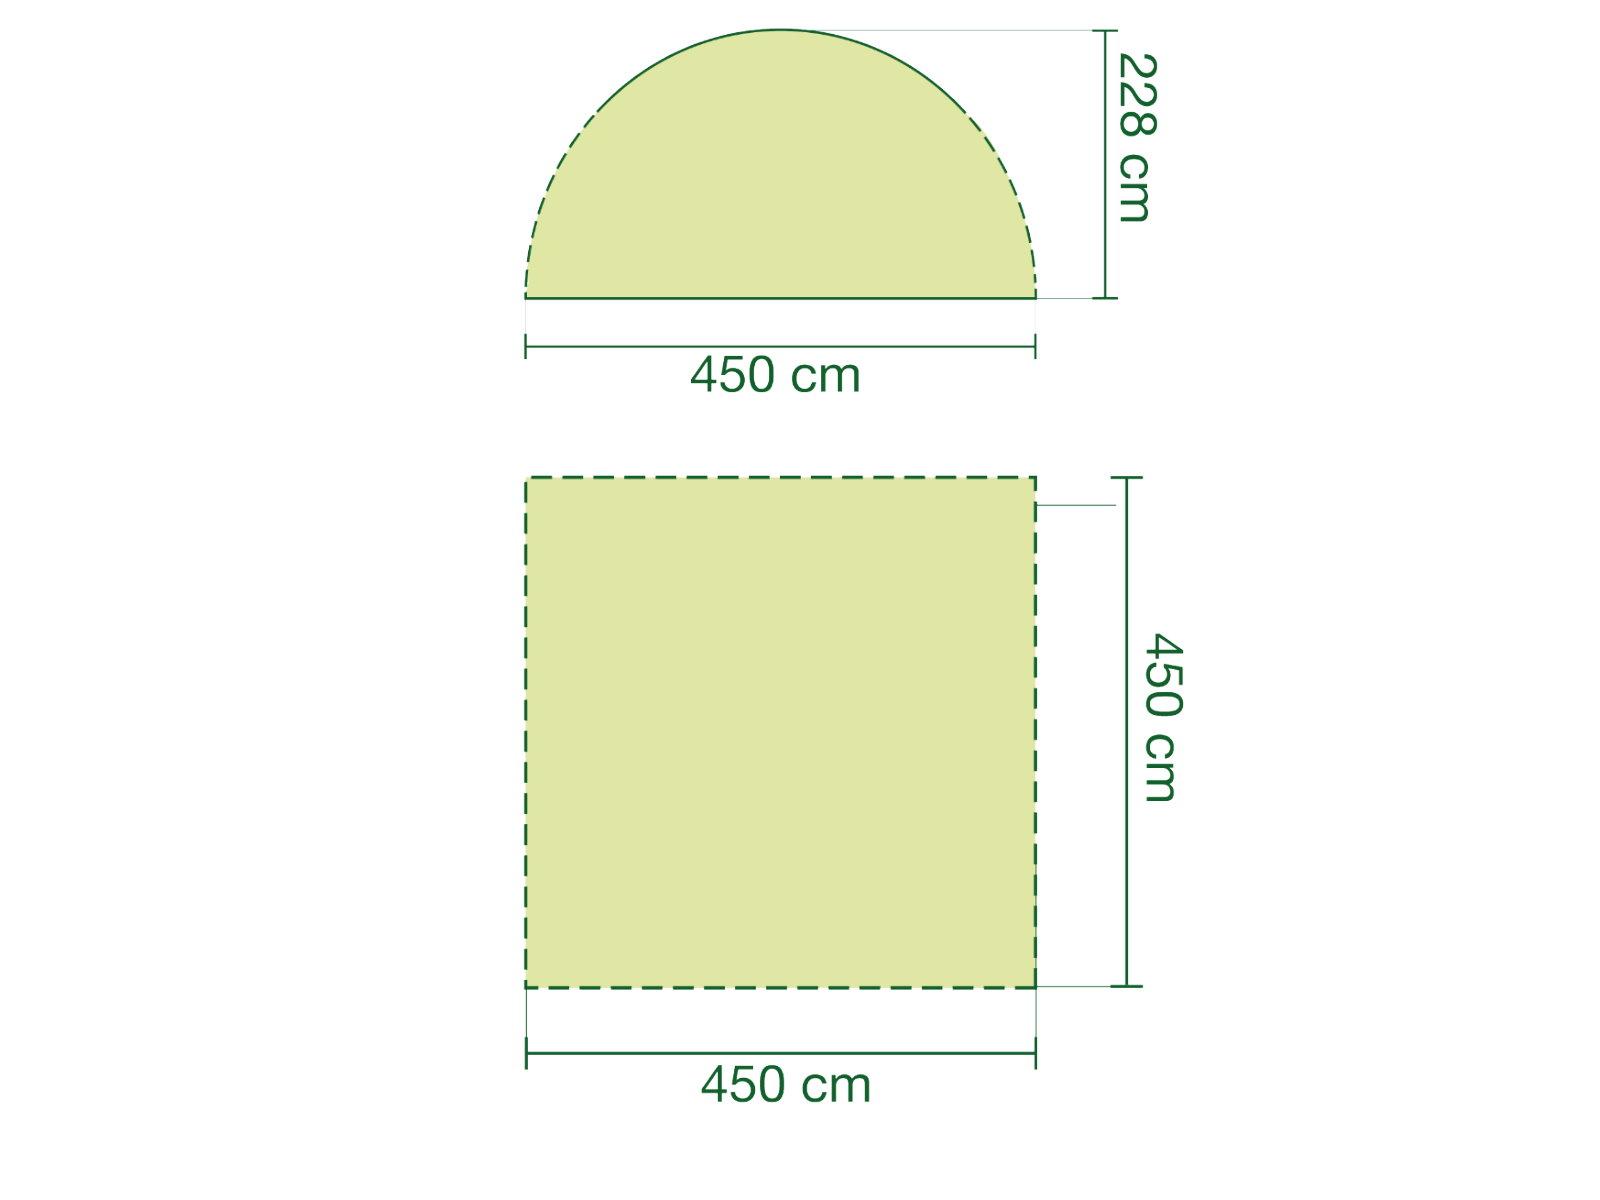 coleman event shelter 4 5 x 4 5 preisvergleich. Black Bedroom Furniture Sets. Home Design Ideas